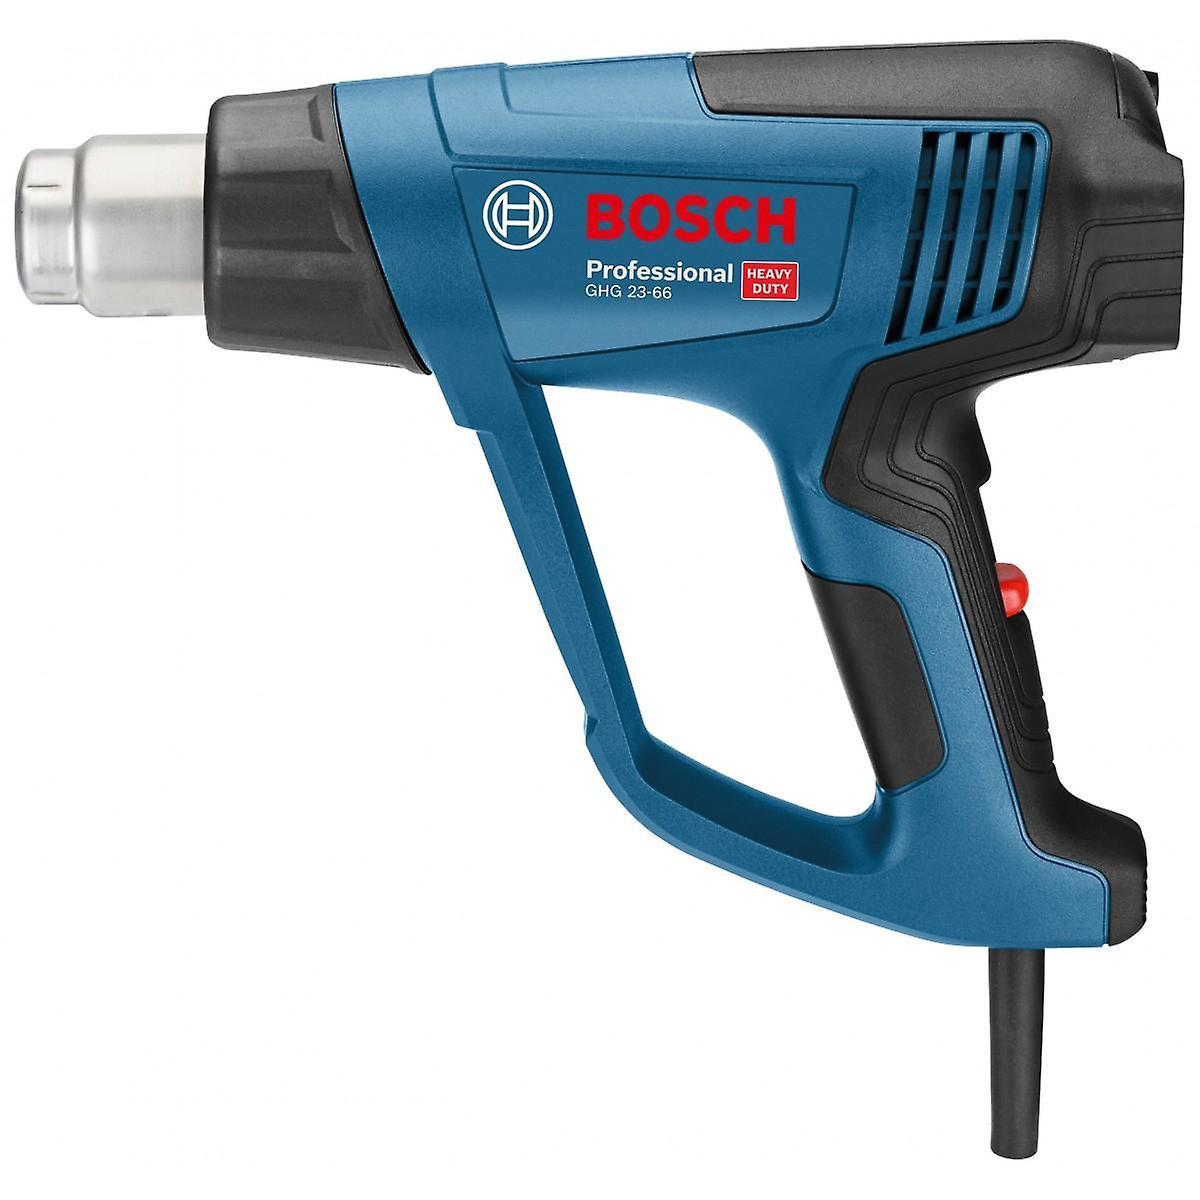 Bosch GHG23-66 Professional Heat Gun 110v